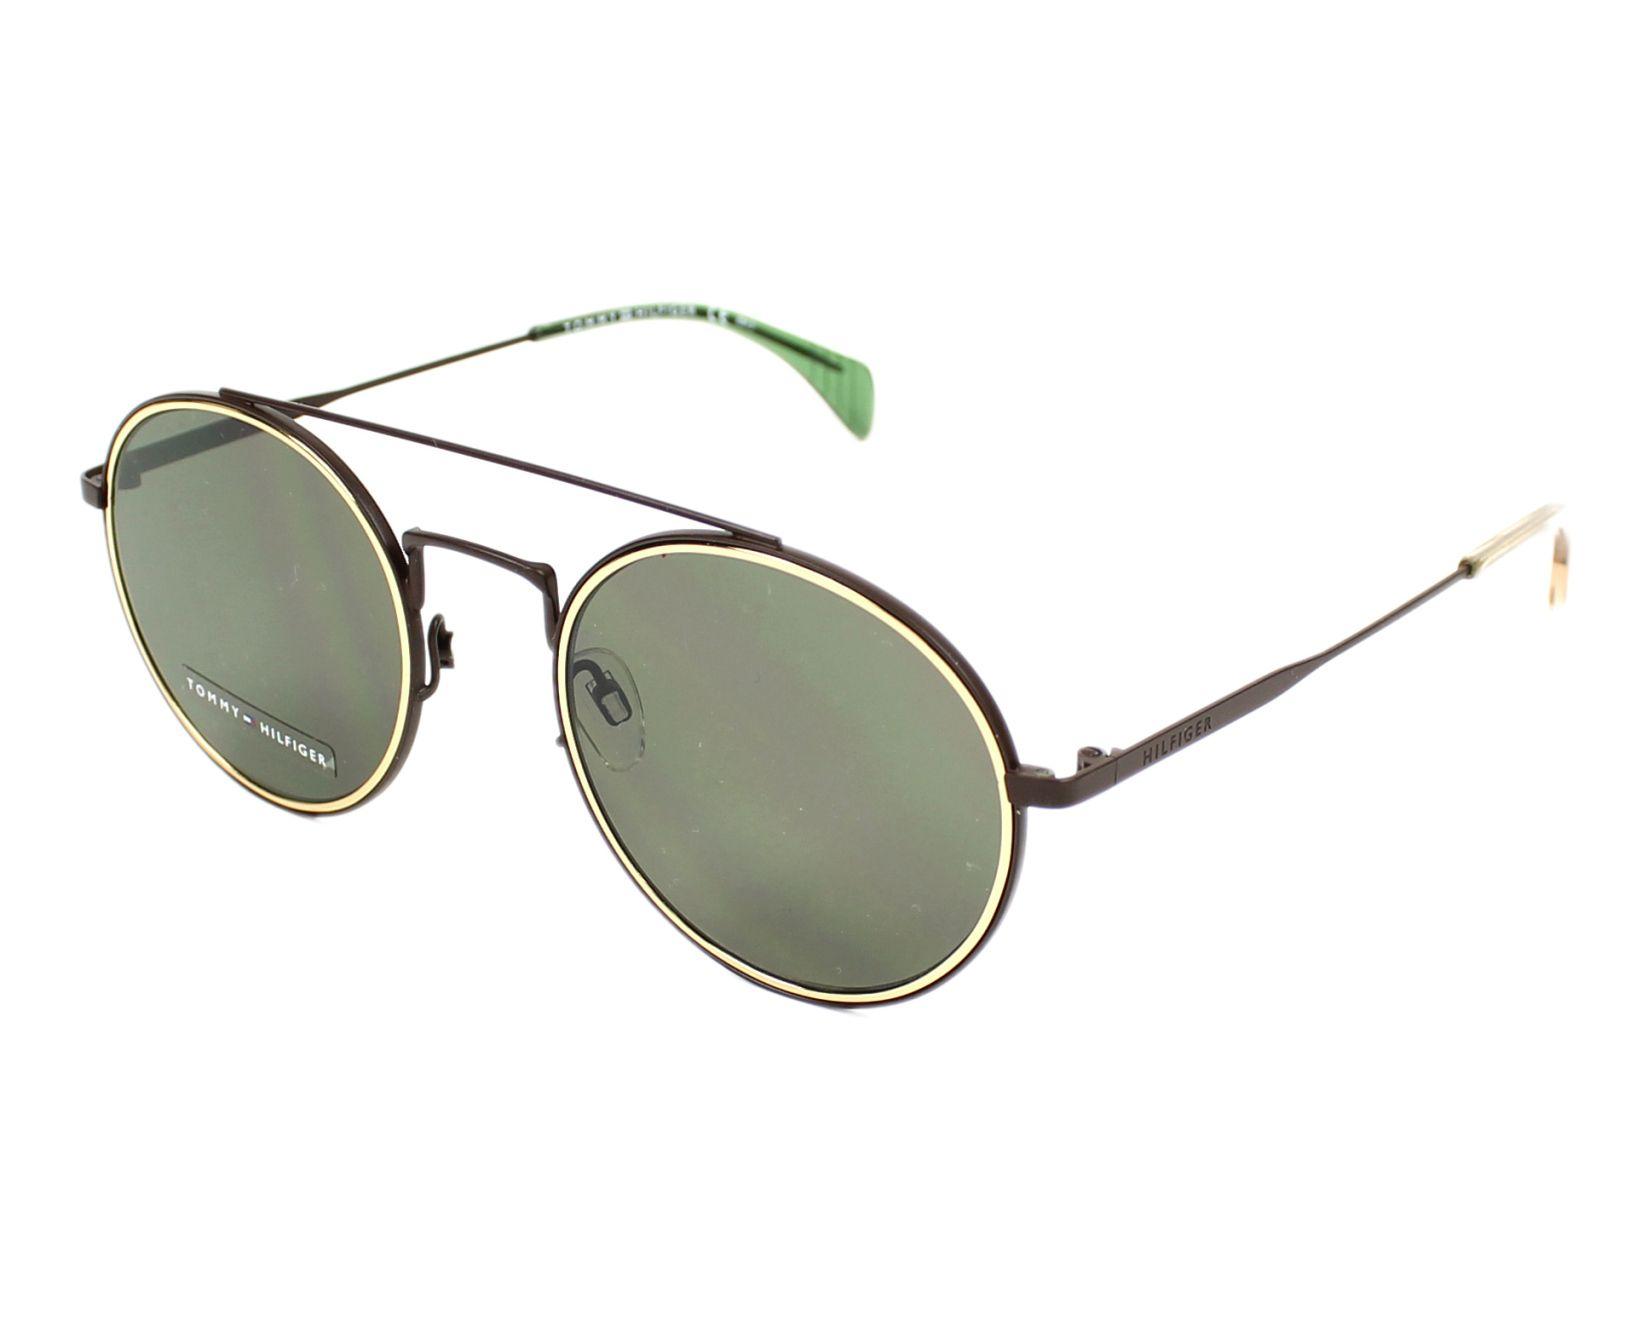 94d827ac86d30 Sunglasses Tommy Hilfiger TH-1455-S 2X3 70 53-22 Brown Gold